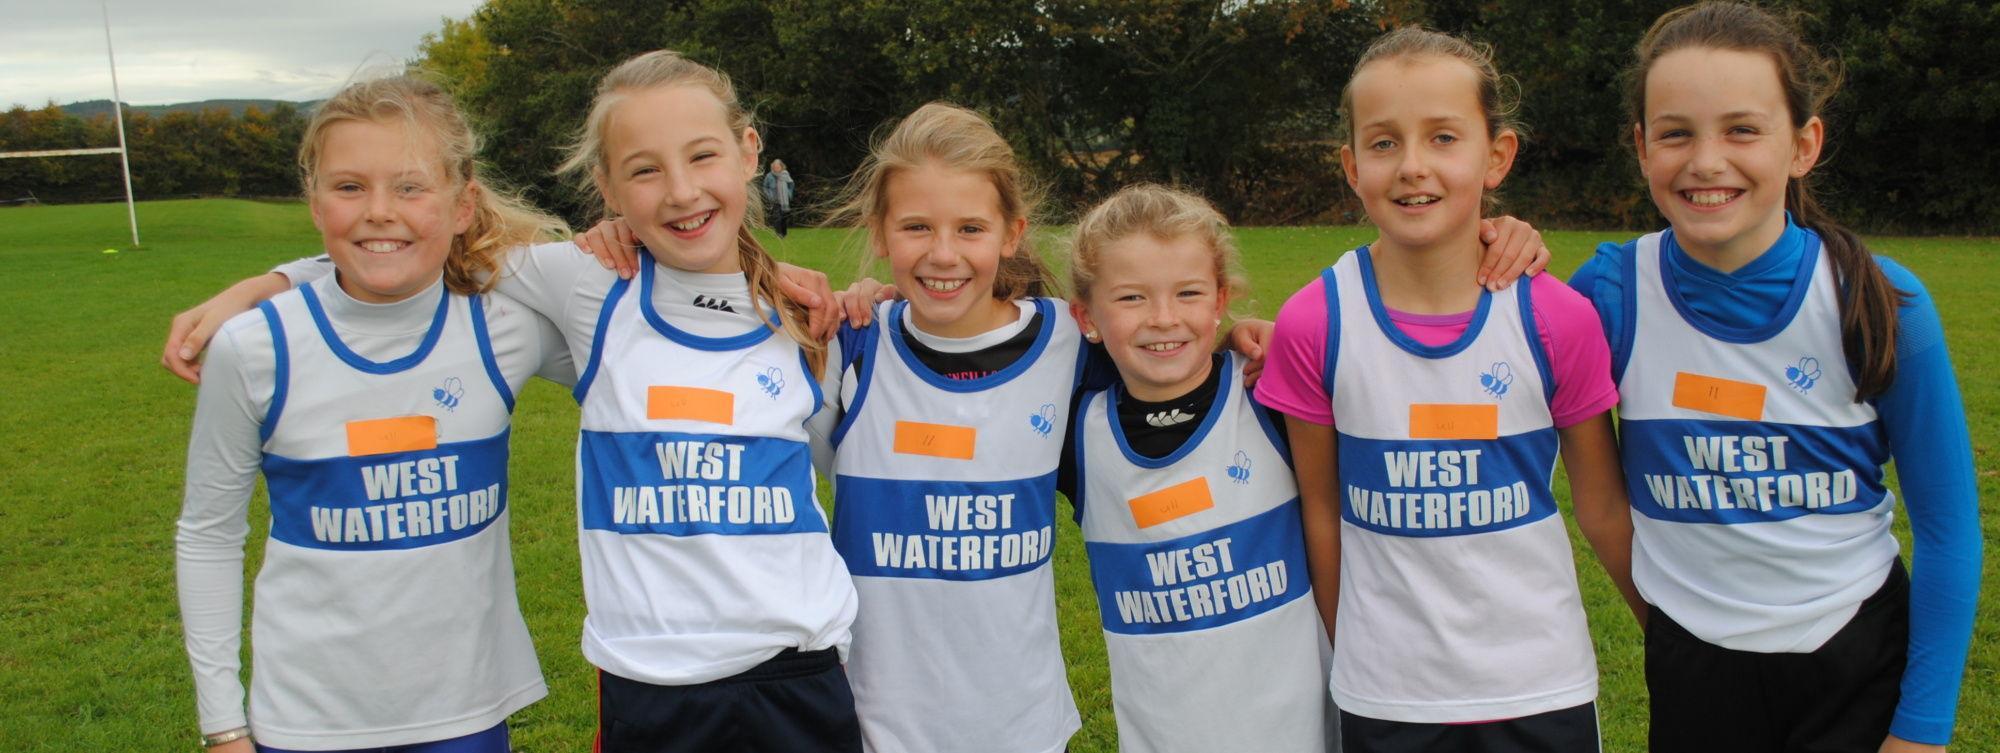 West Waterford Athletic Club